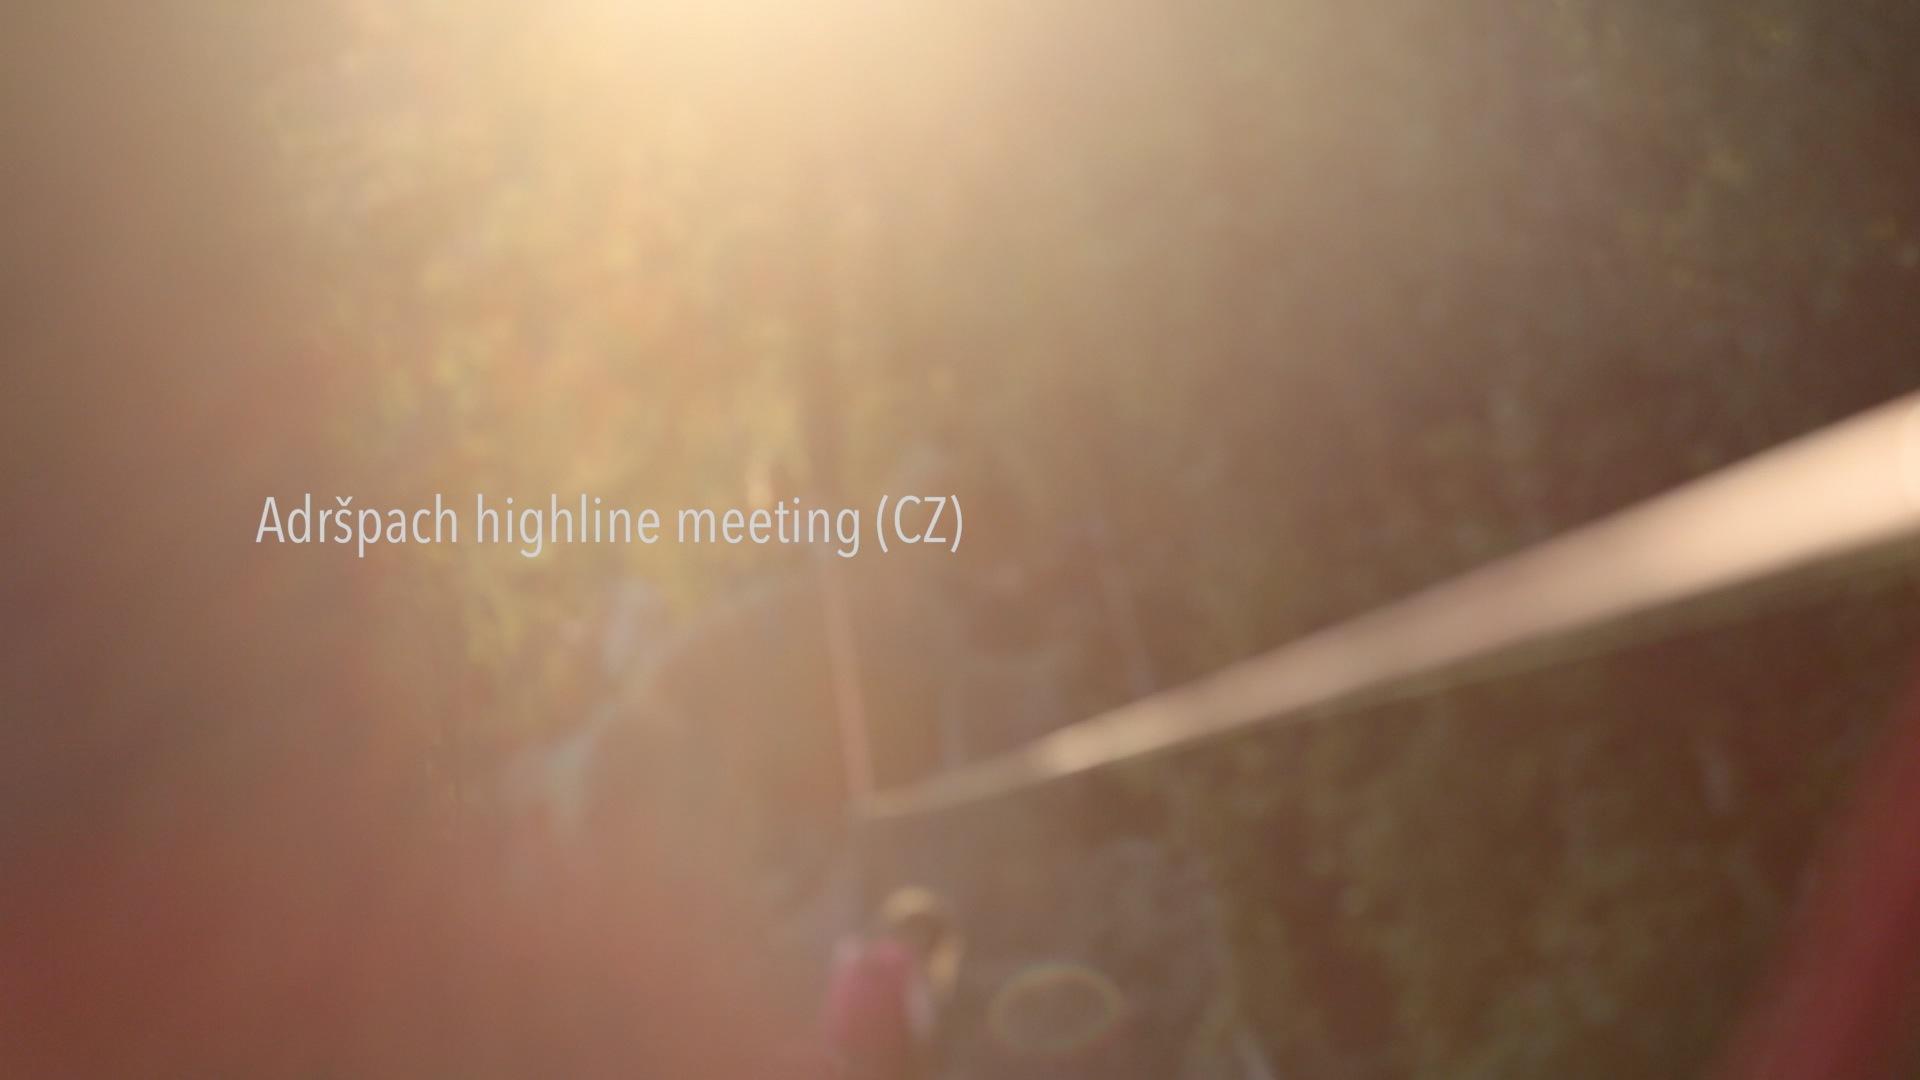 Adrspach Higline Meeting (CZ)